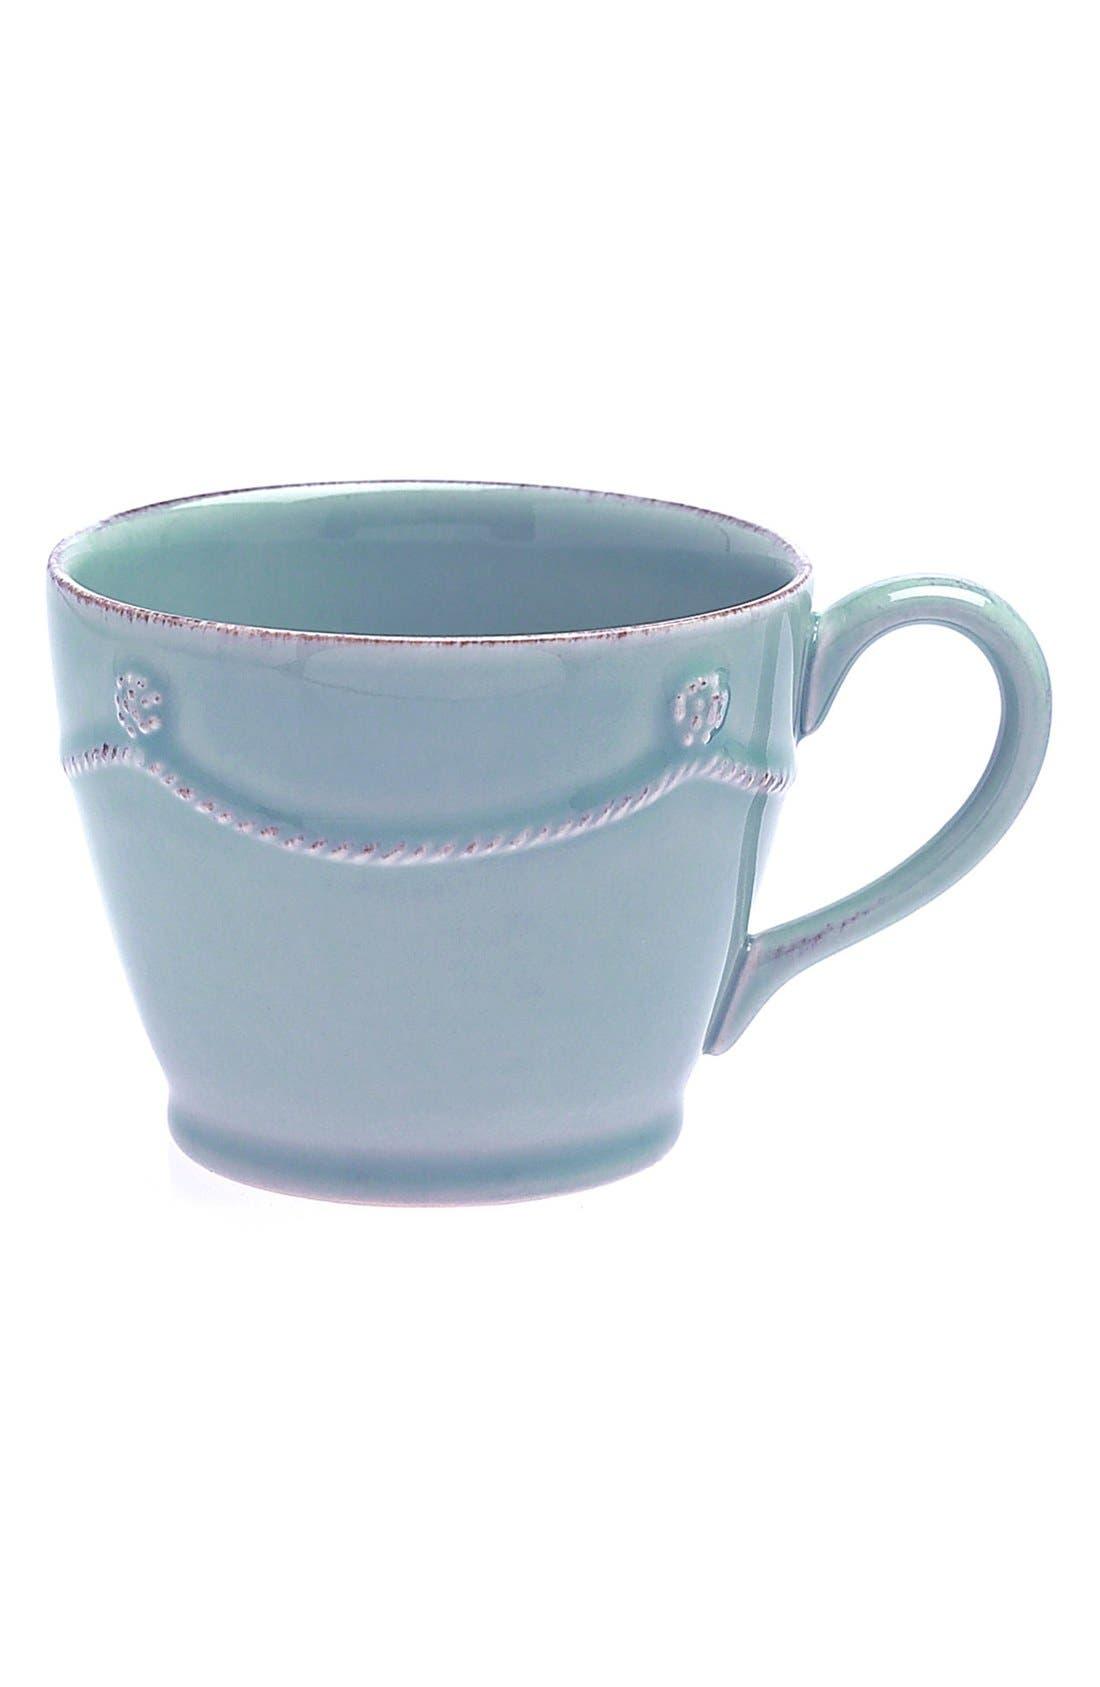 Main Image - Juliska'Berry and Thread' Tea &Coffee Cup